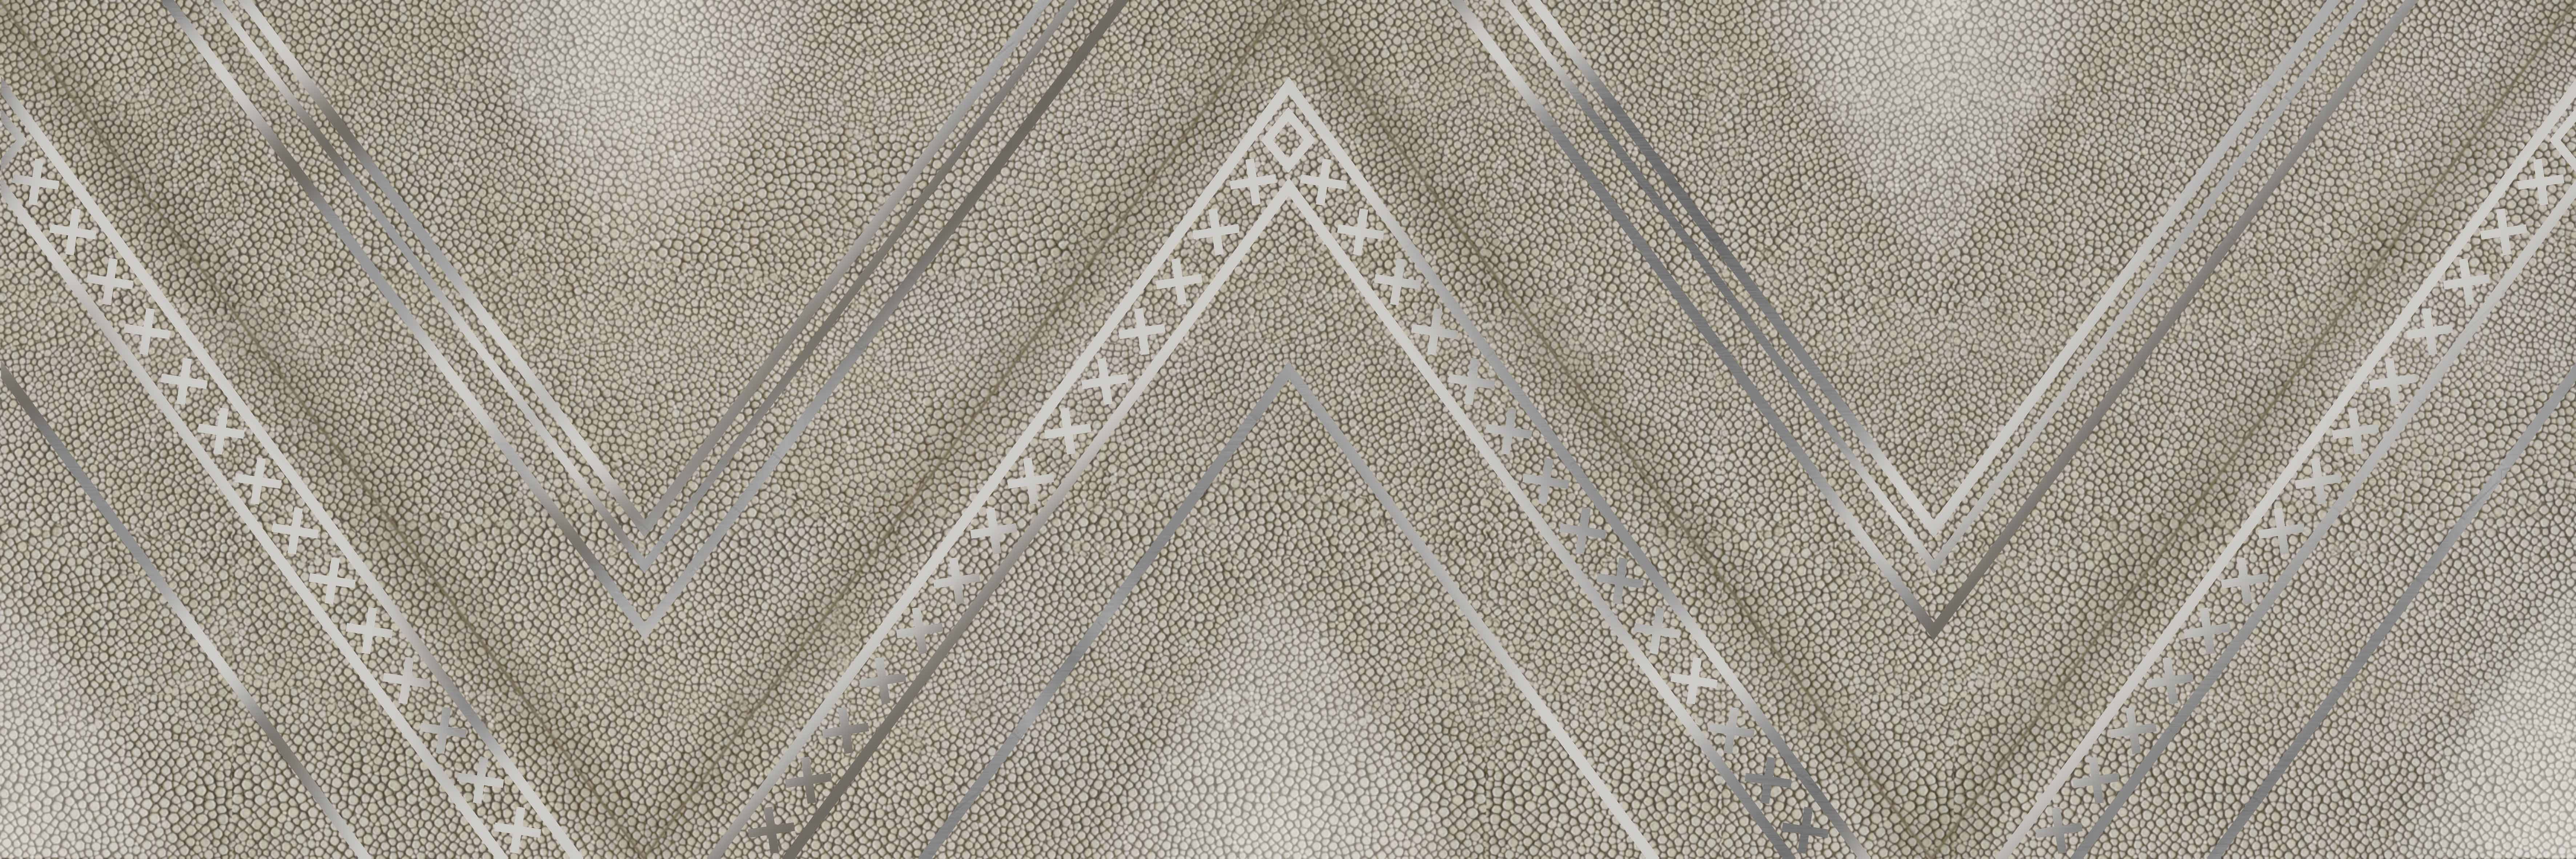 Декор Stingray Lozenge Graphite